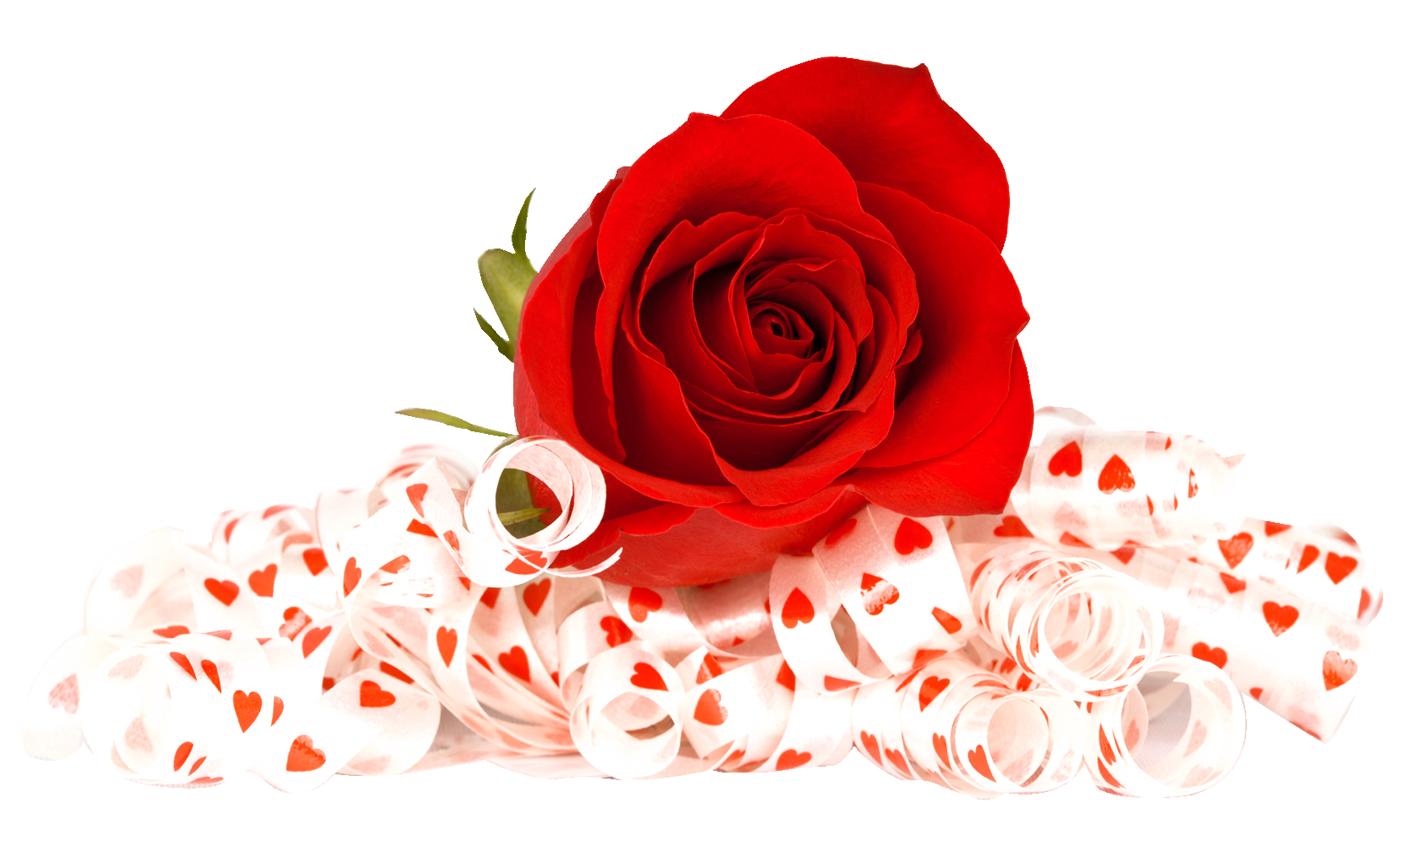 Rose Png Image Purepng Free Transparent Cc0 Png Image Library